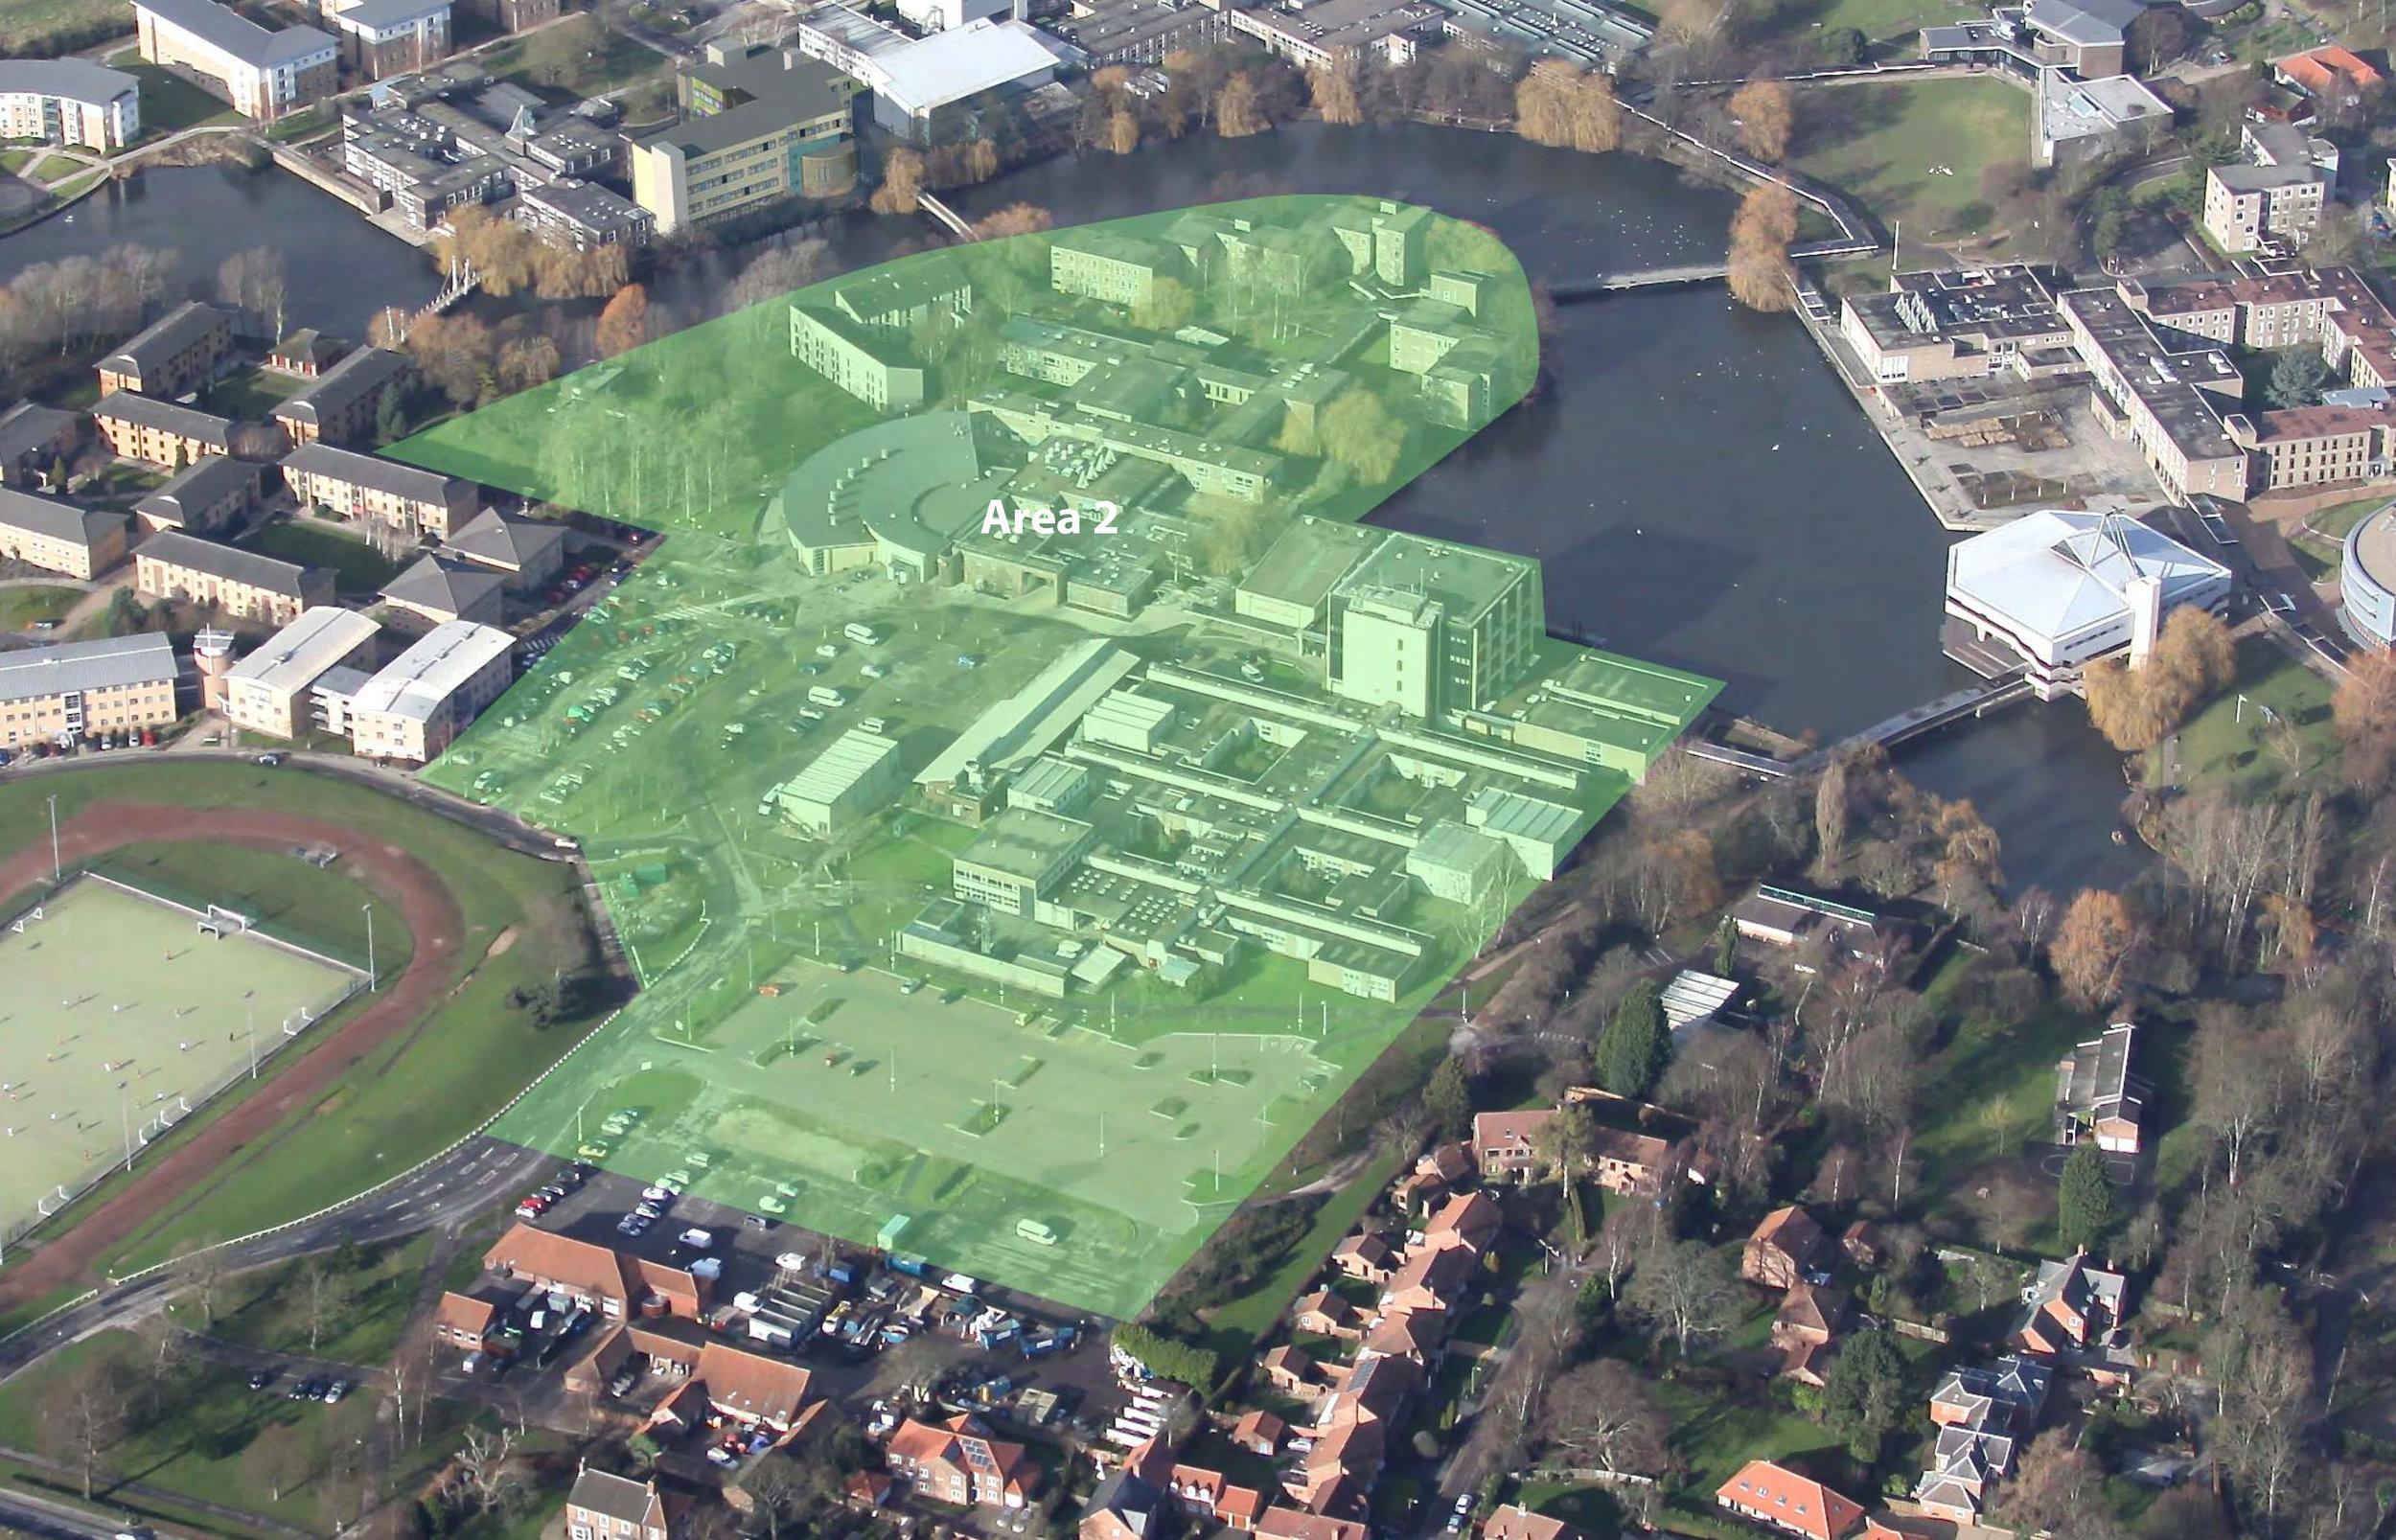 Stephen-Hill-Architects-YorkMasterPlan-12